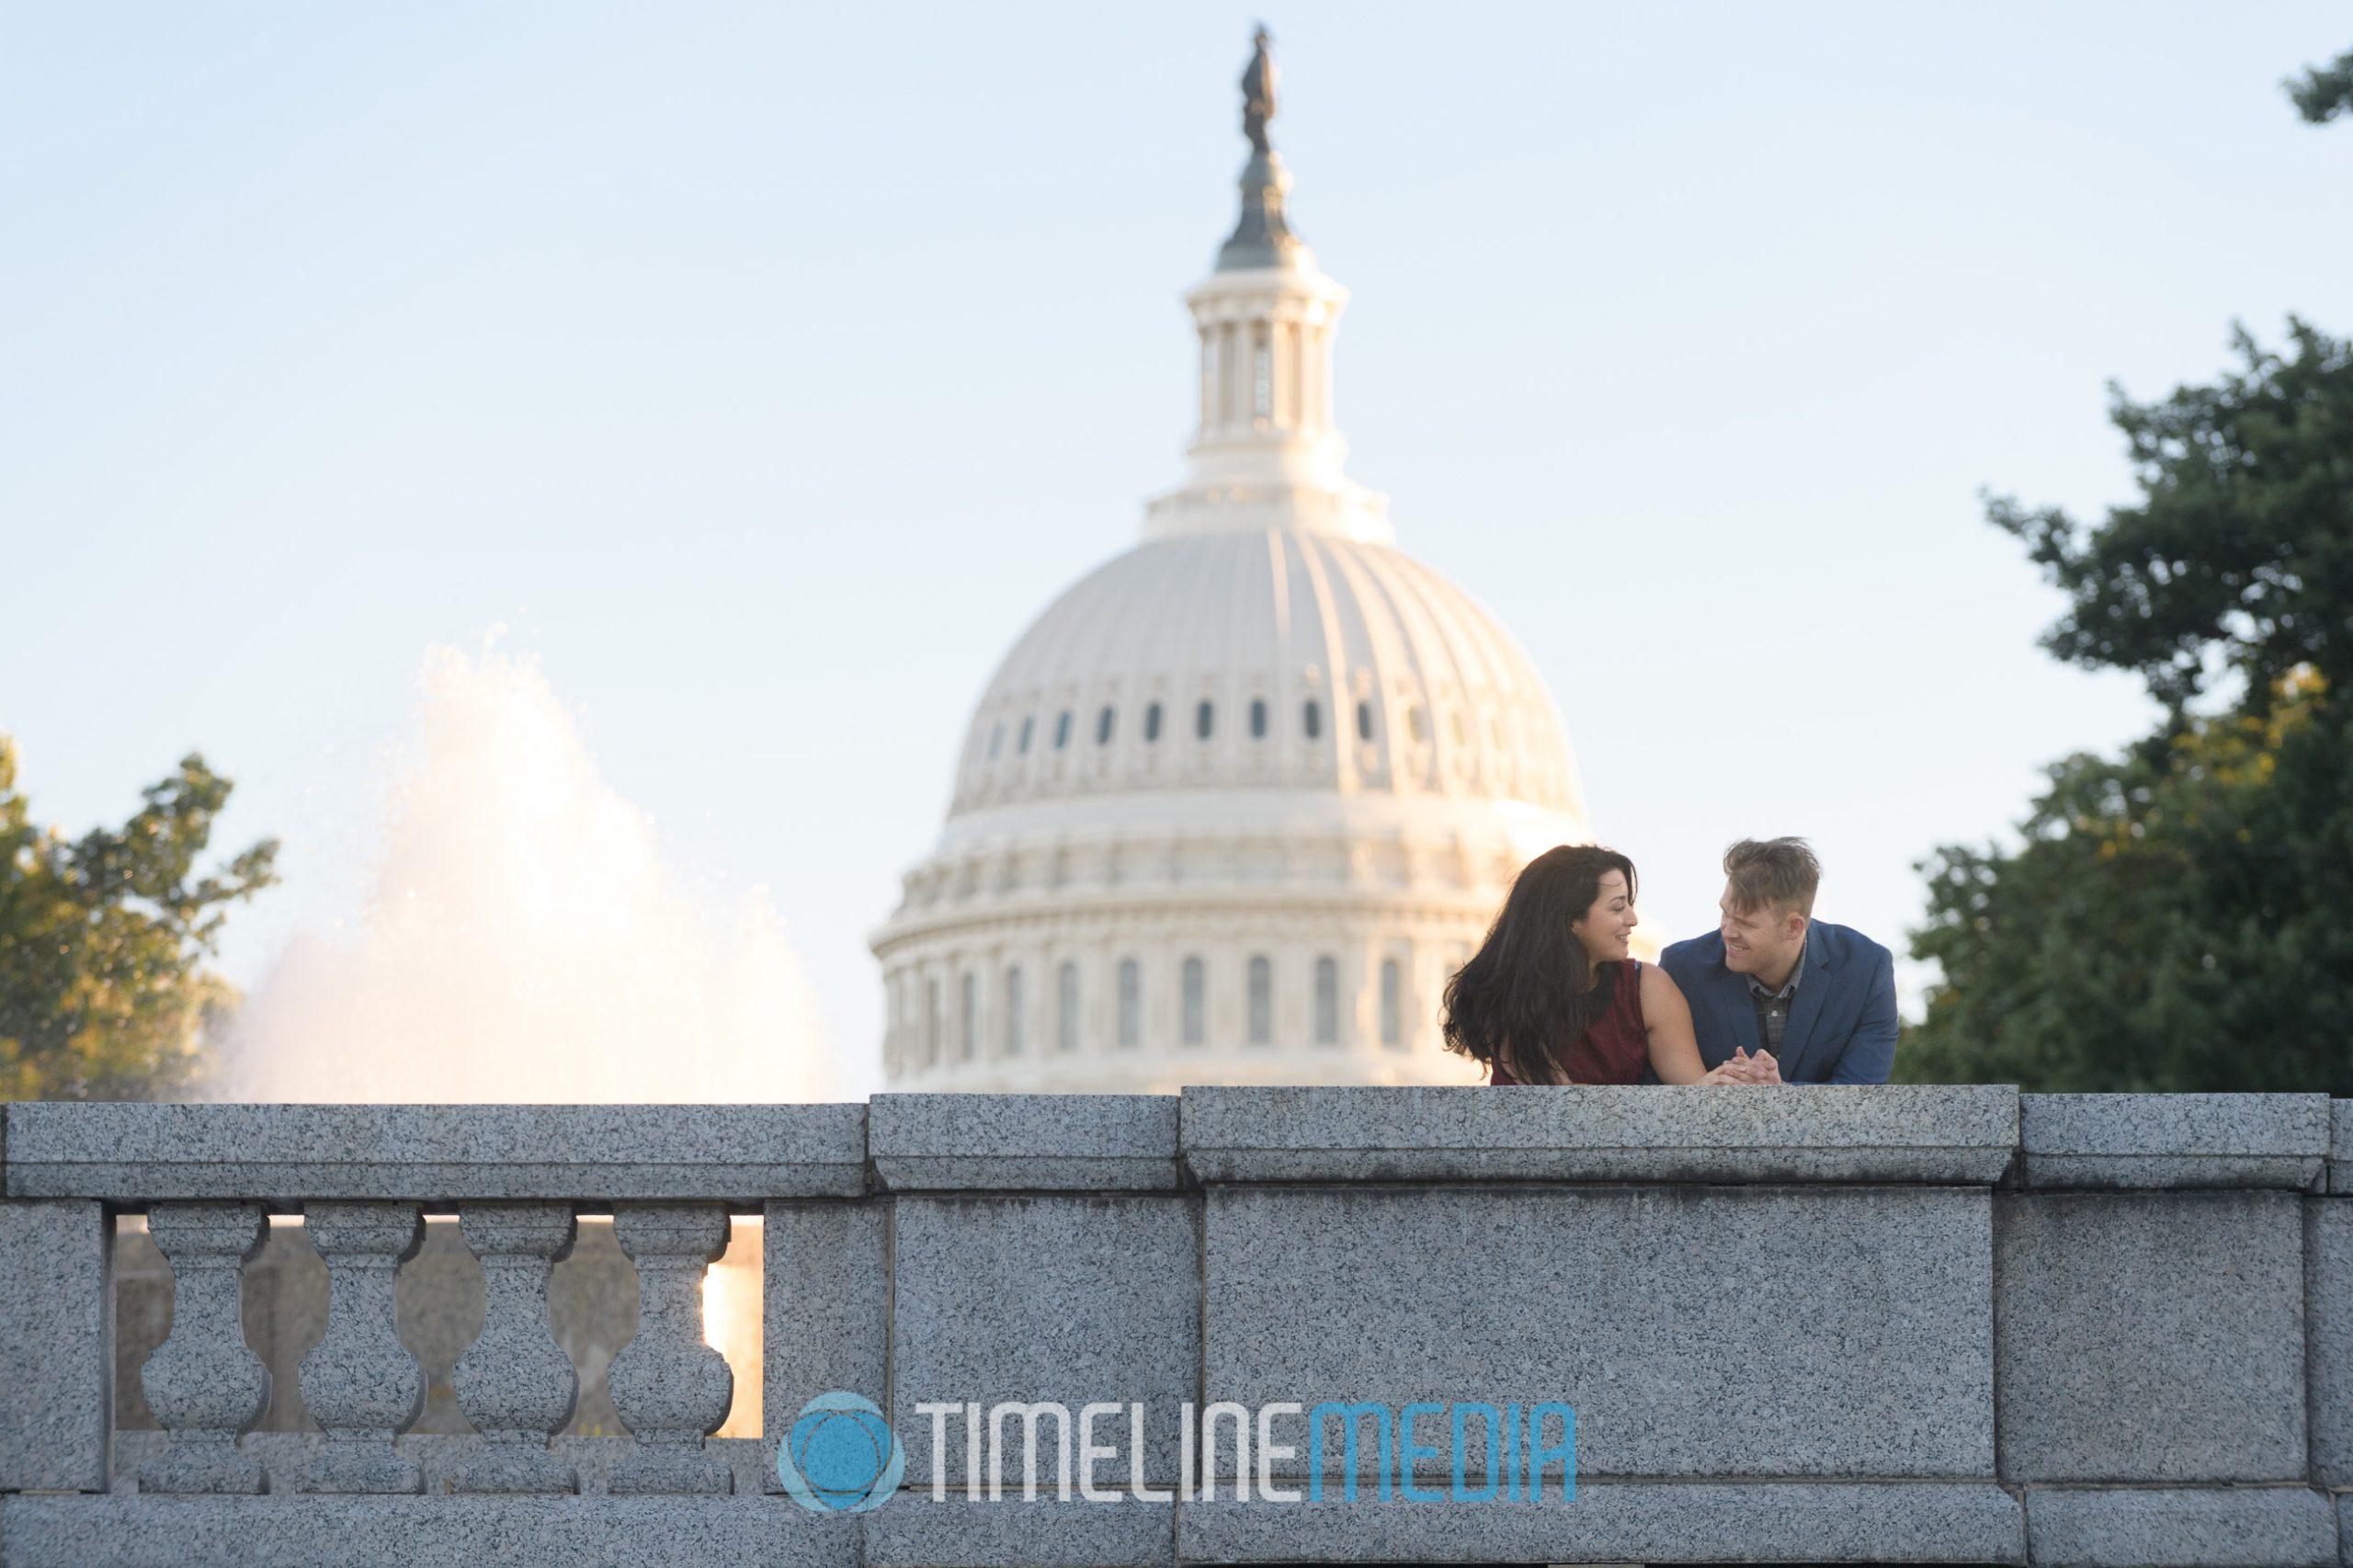 Frances and Carlo Engagement photo session in Washington, DC ©TimeLine Media